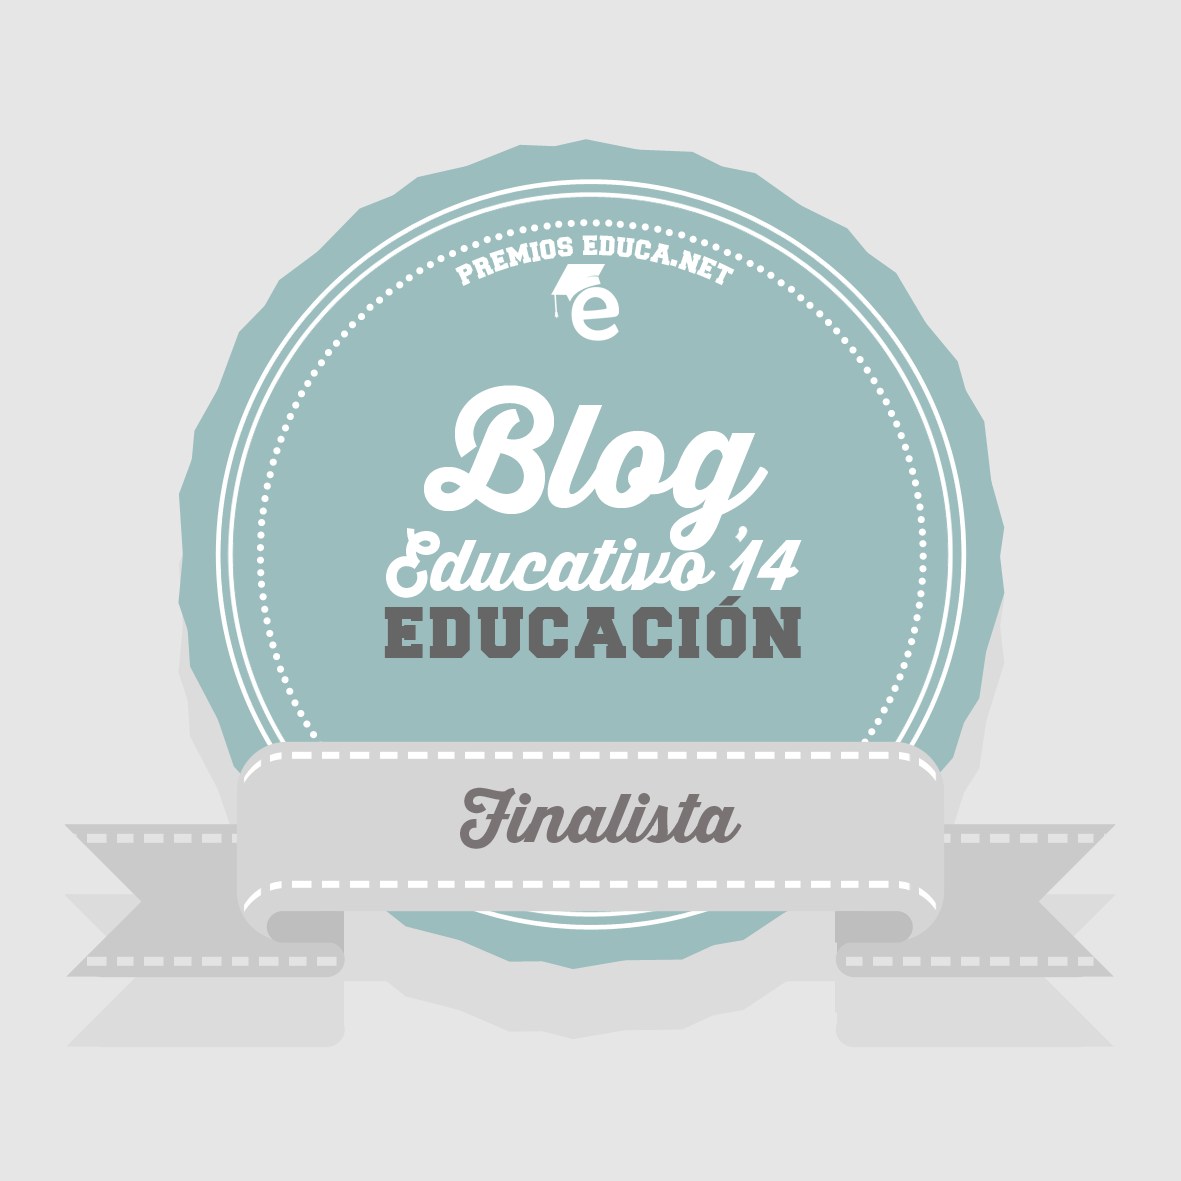 Premio Educa.net 2014 para